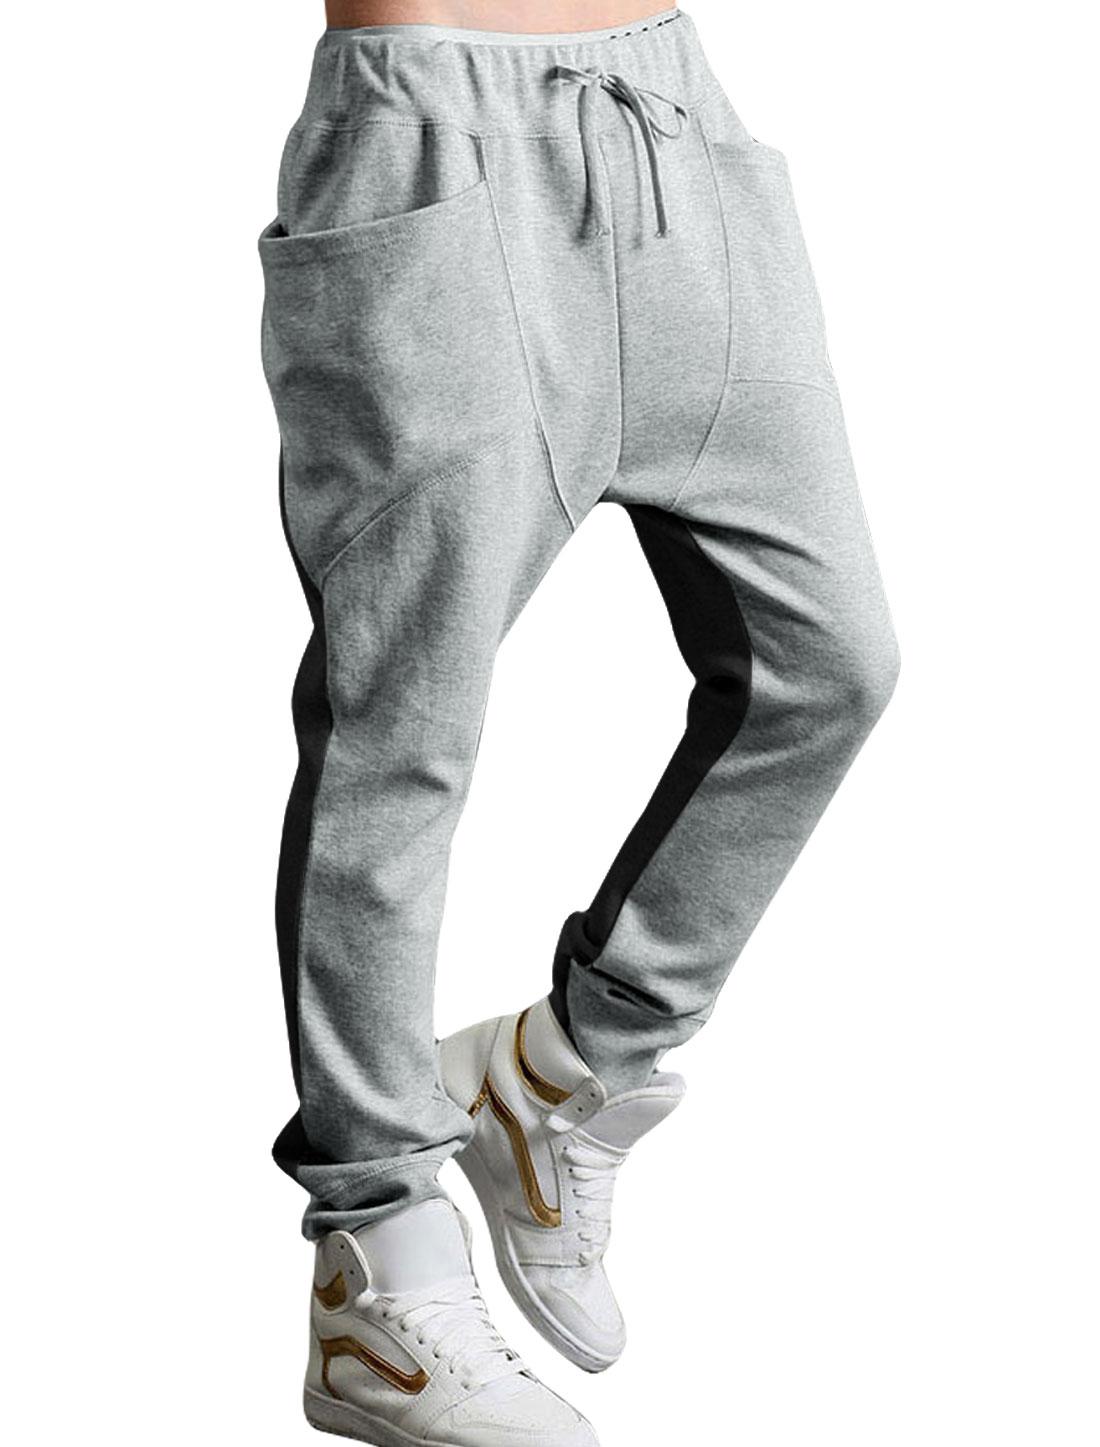 Men Funnel-Pocket Drawstring Harem Pants Gray Blak W36/38